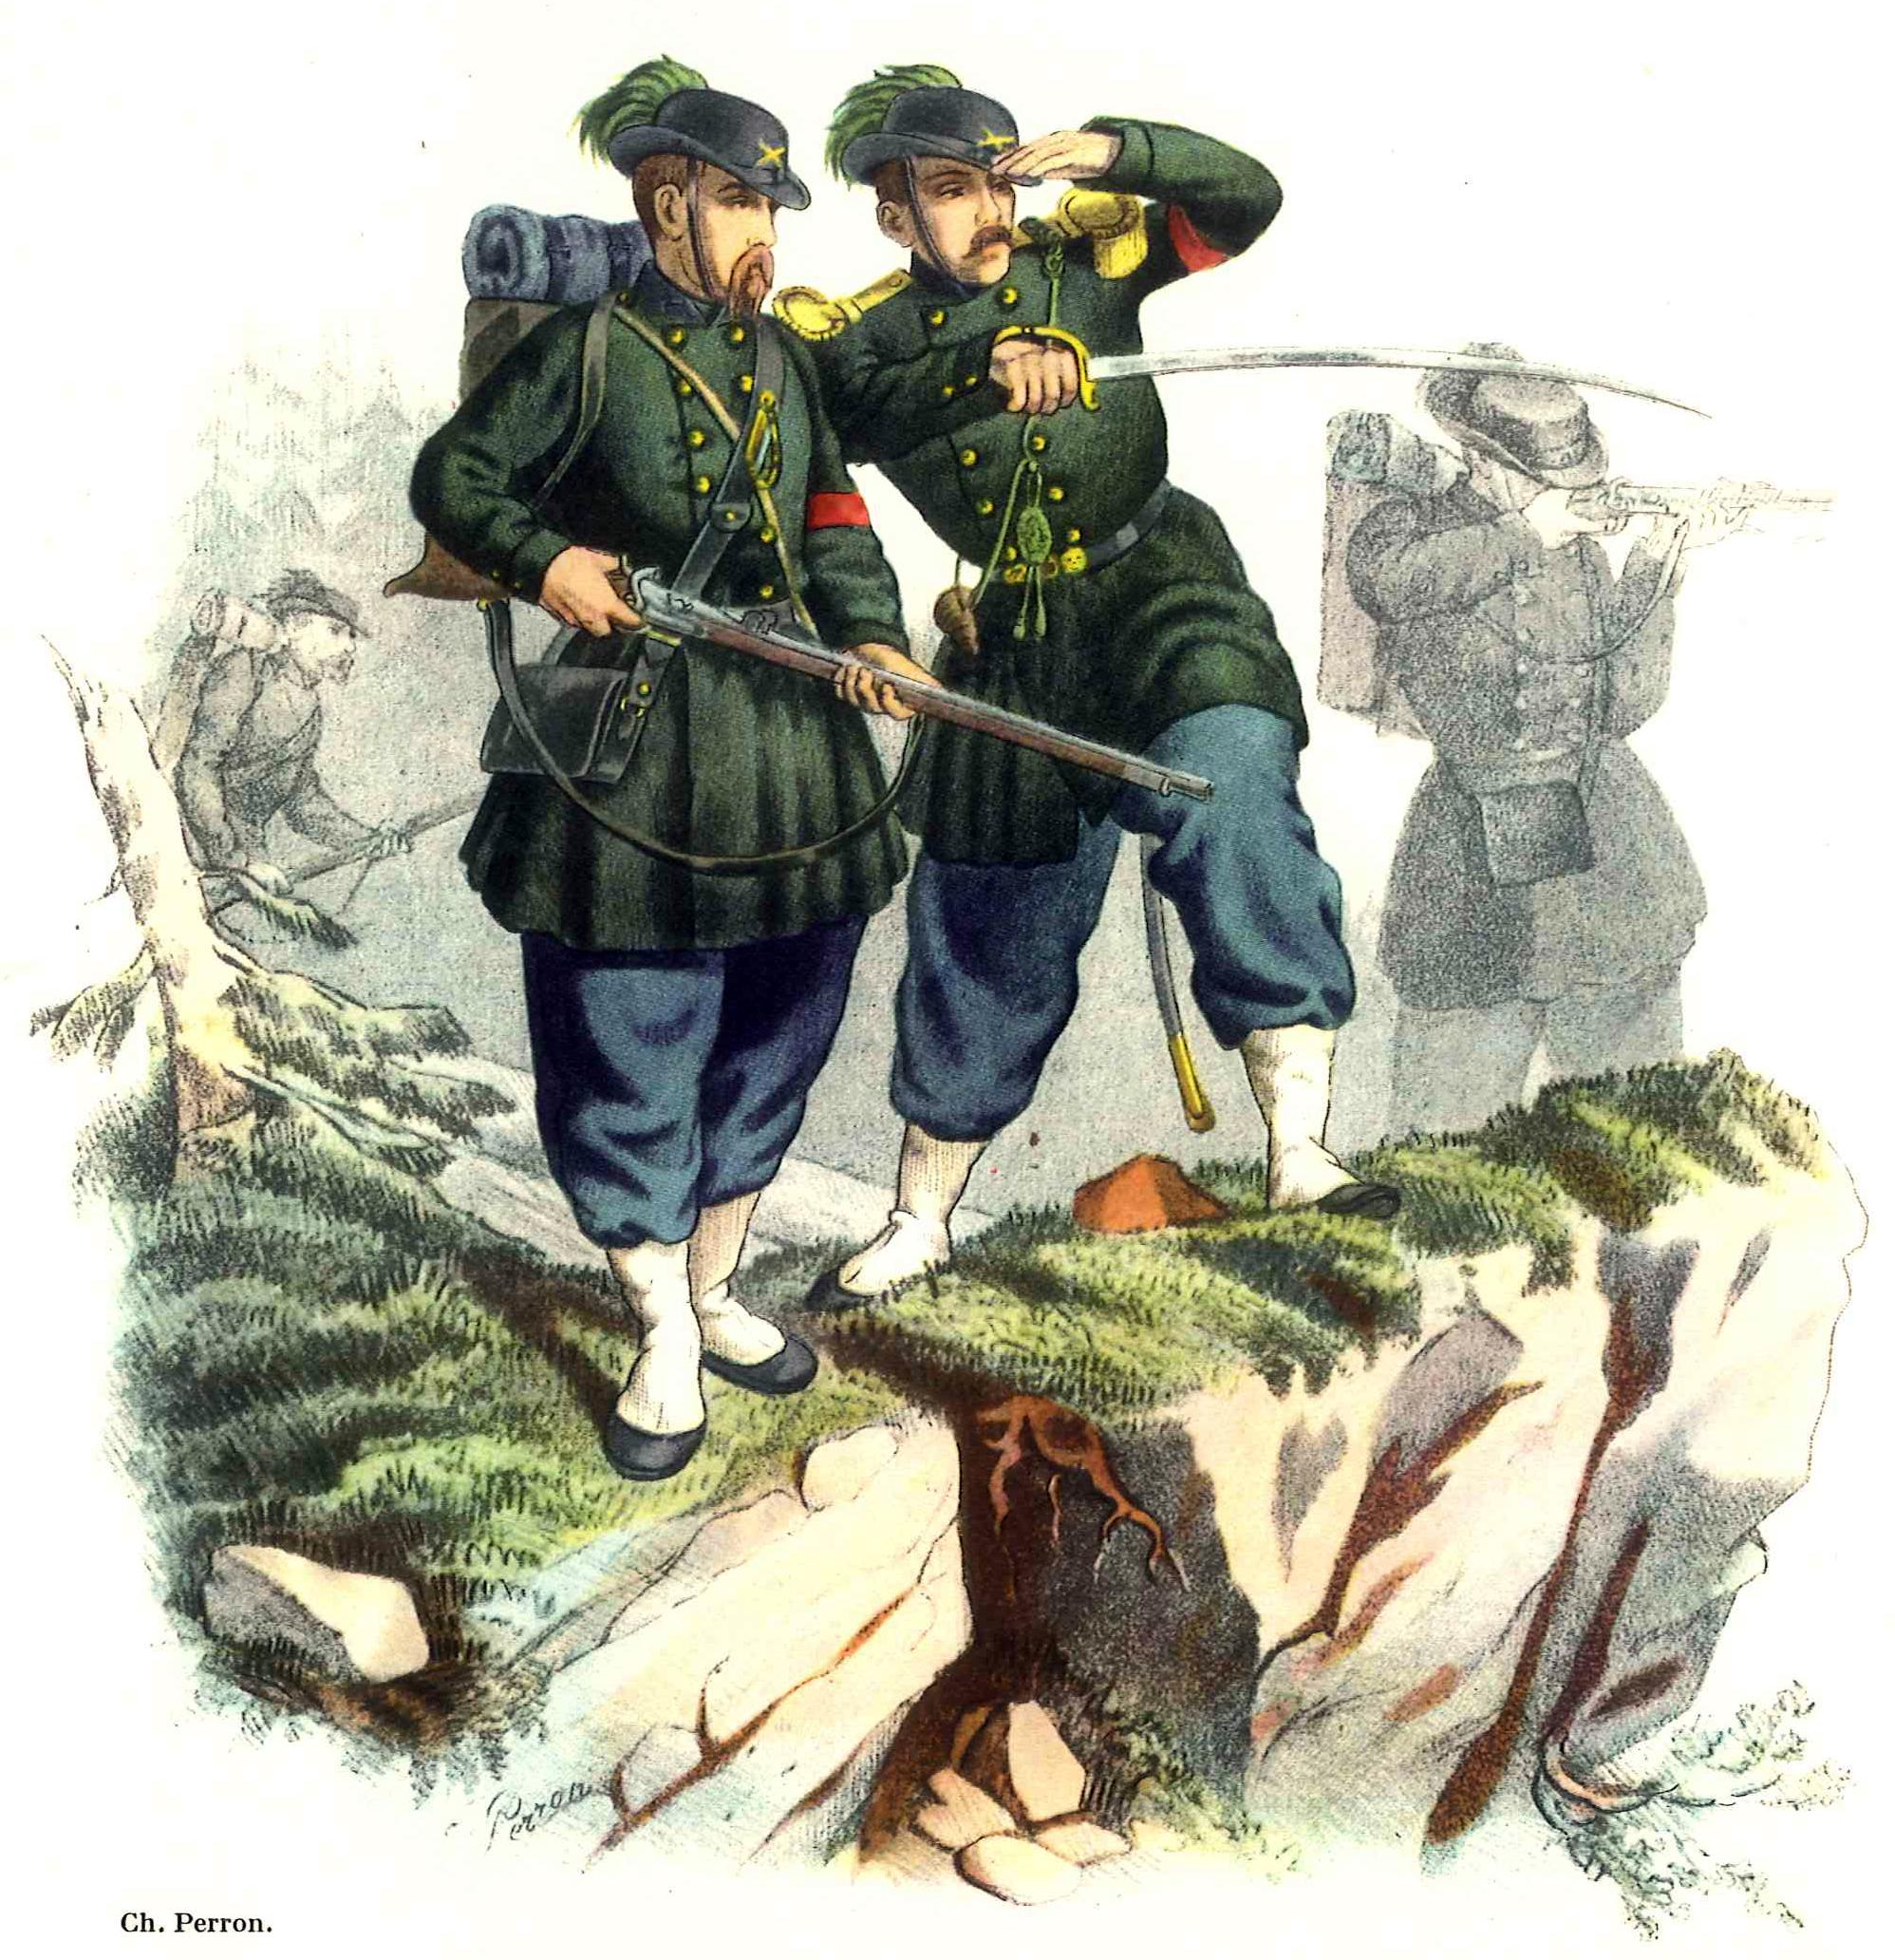 Description schweizer armee scharfschuetzen 1862